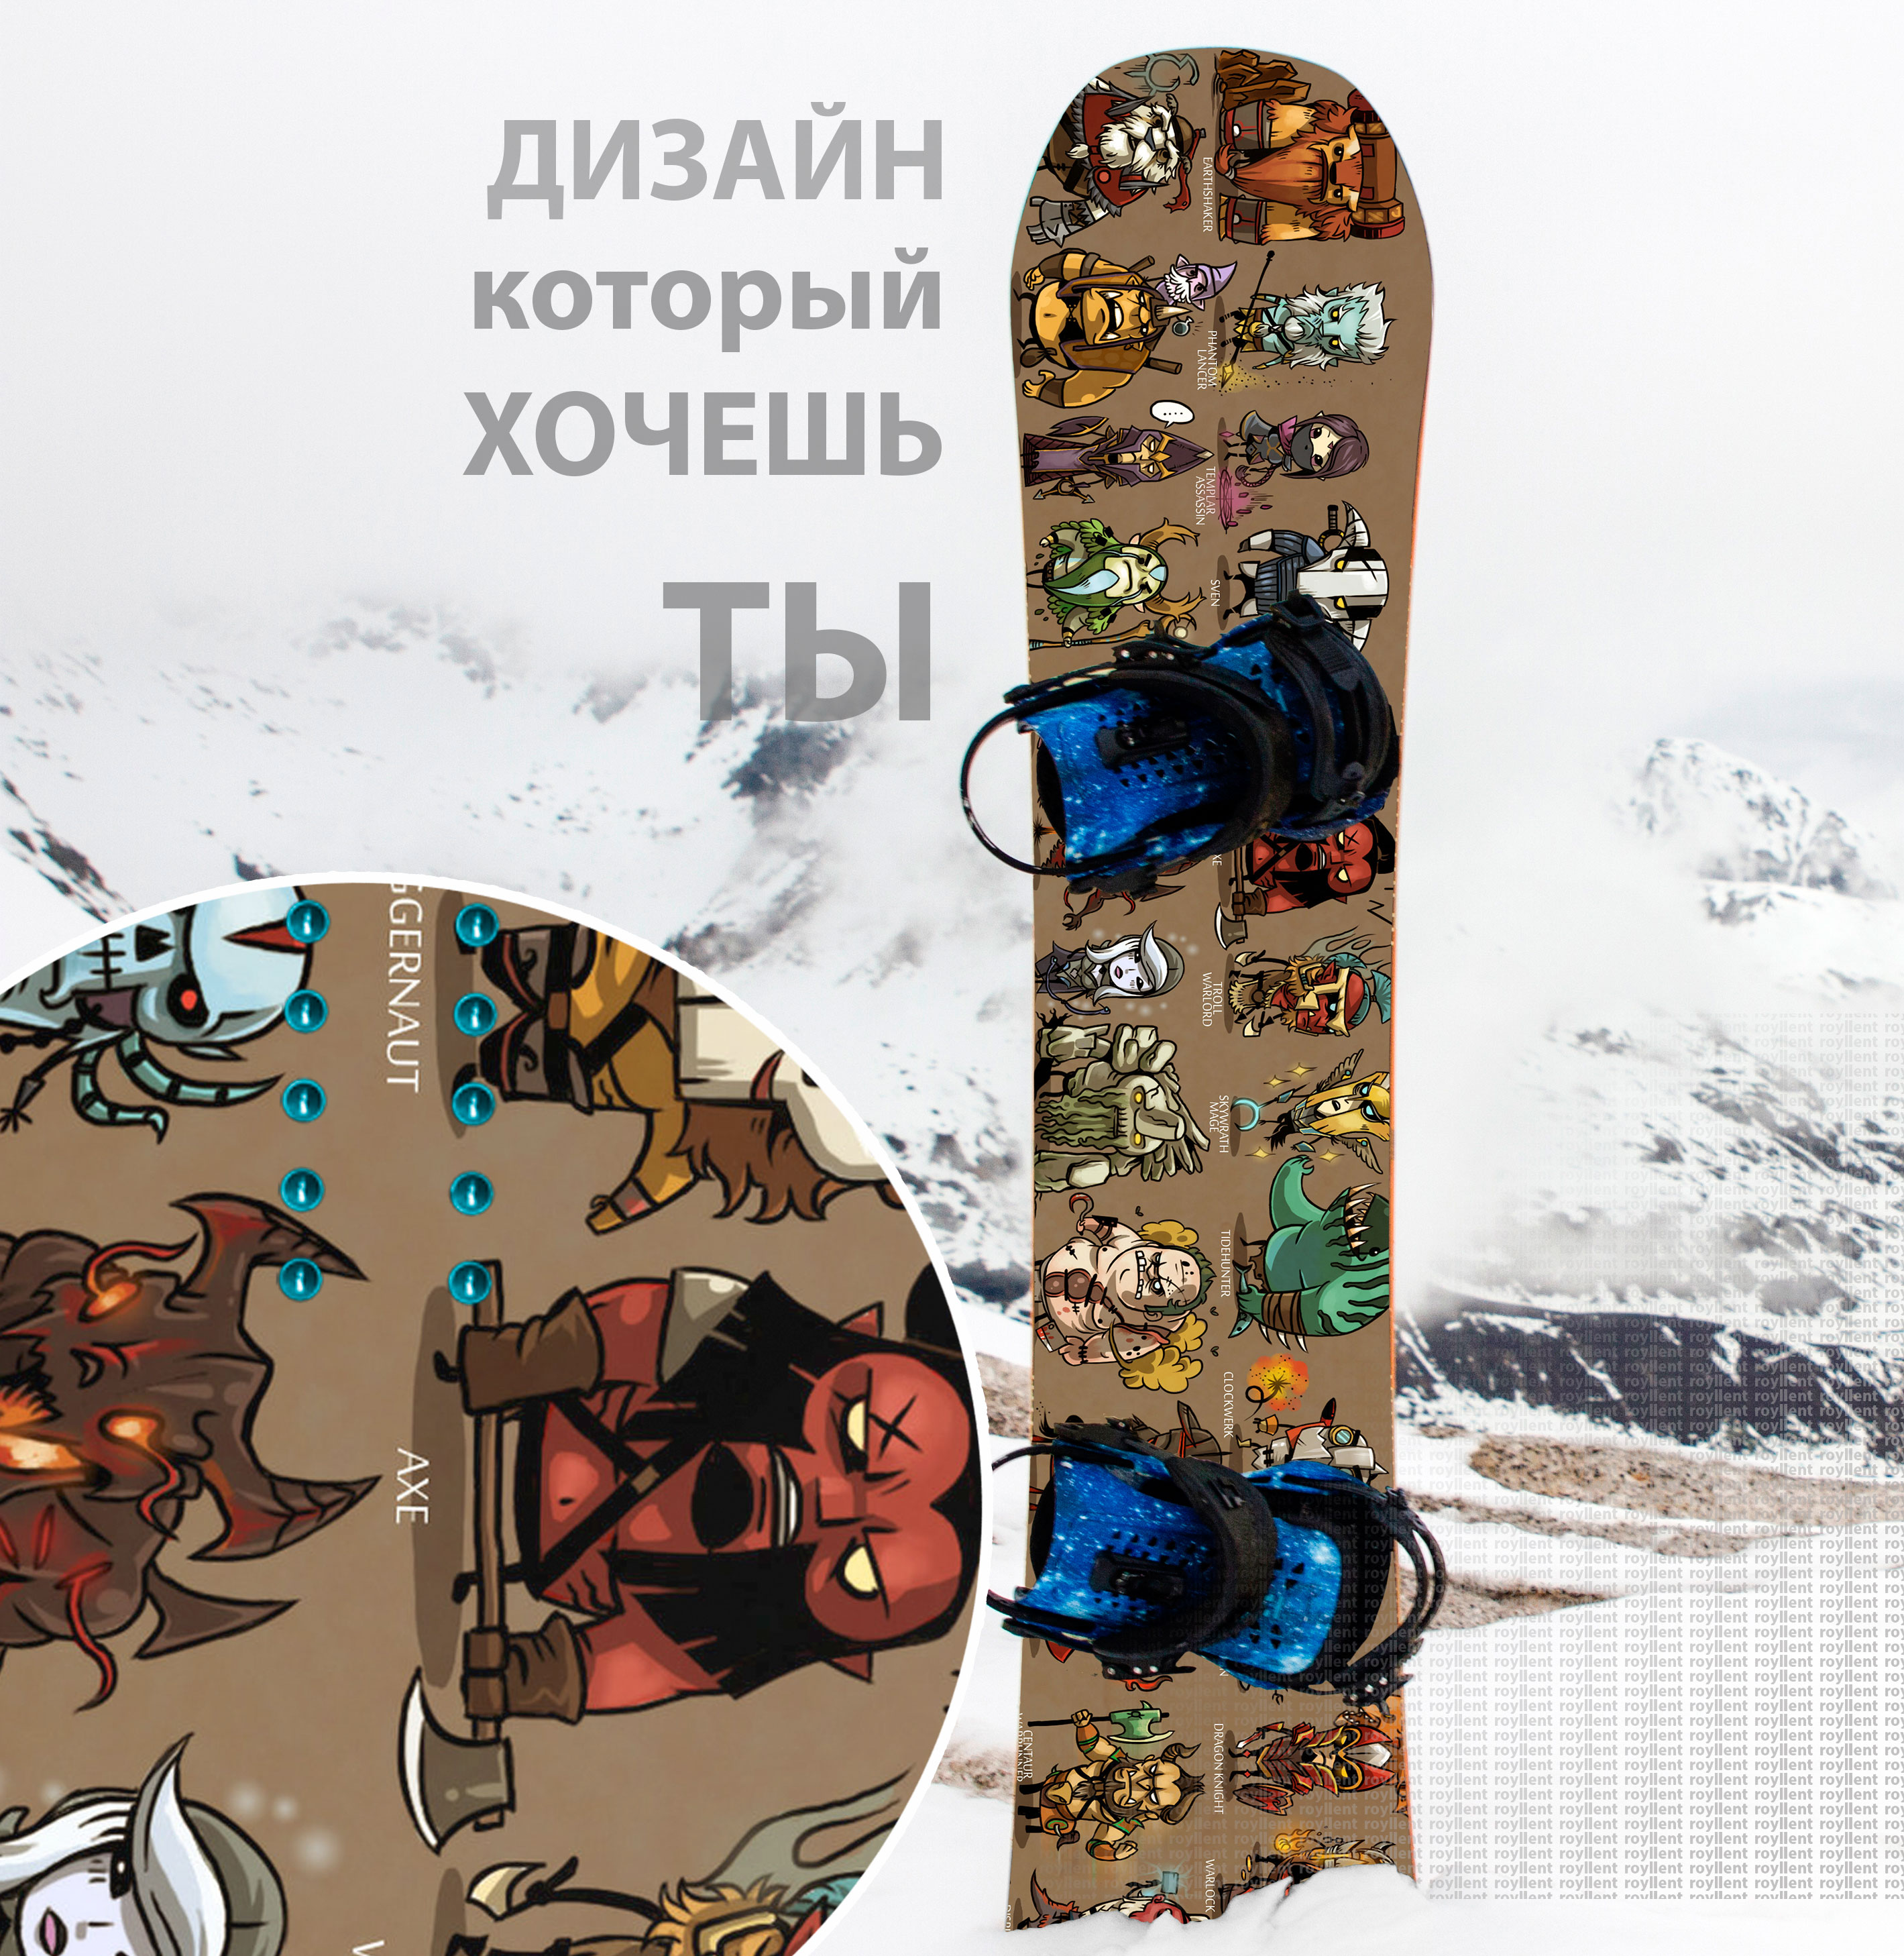 наклейки на сноуборд купить